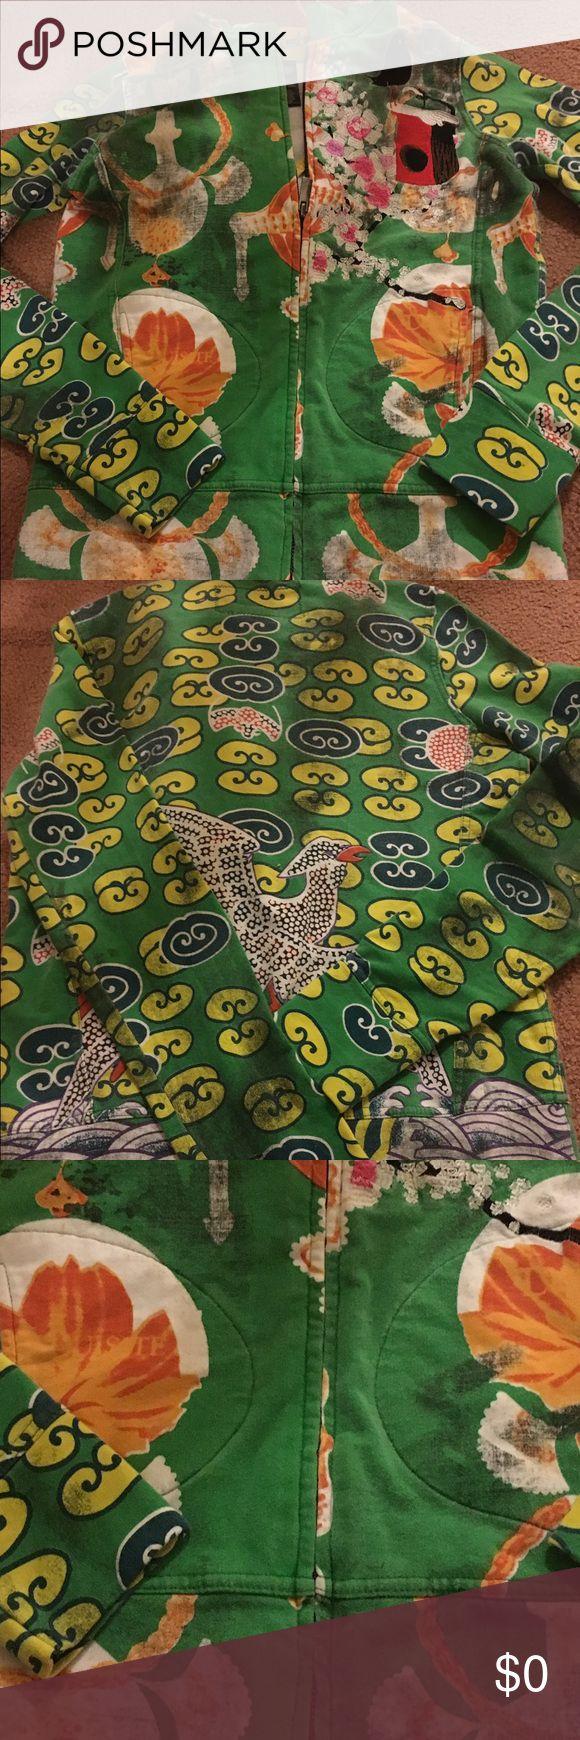 GUSTO Barcelona Fan hooded zip up GUC. Multi color zip up hoodie Custo Barcelona Tops Sweatshirts & Hoodies